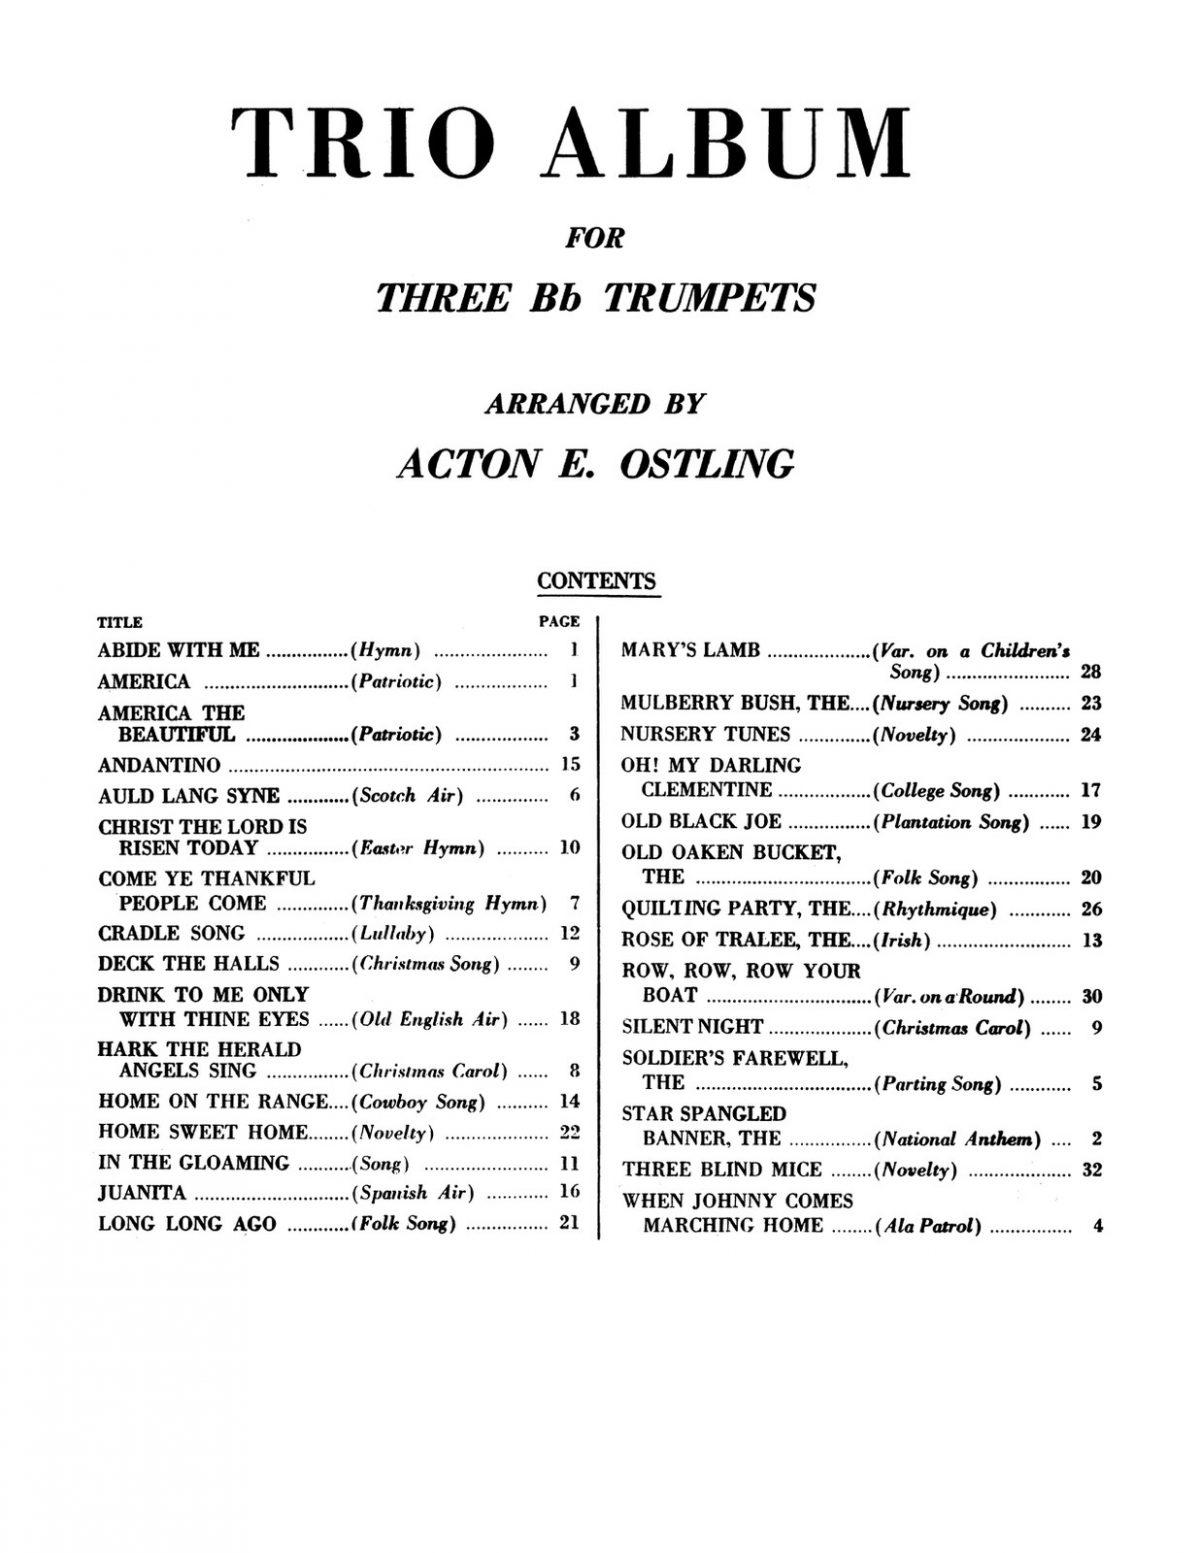 Ostling, Trio Album for 3 Bb Trumpets-p03